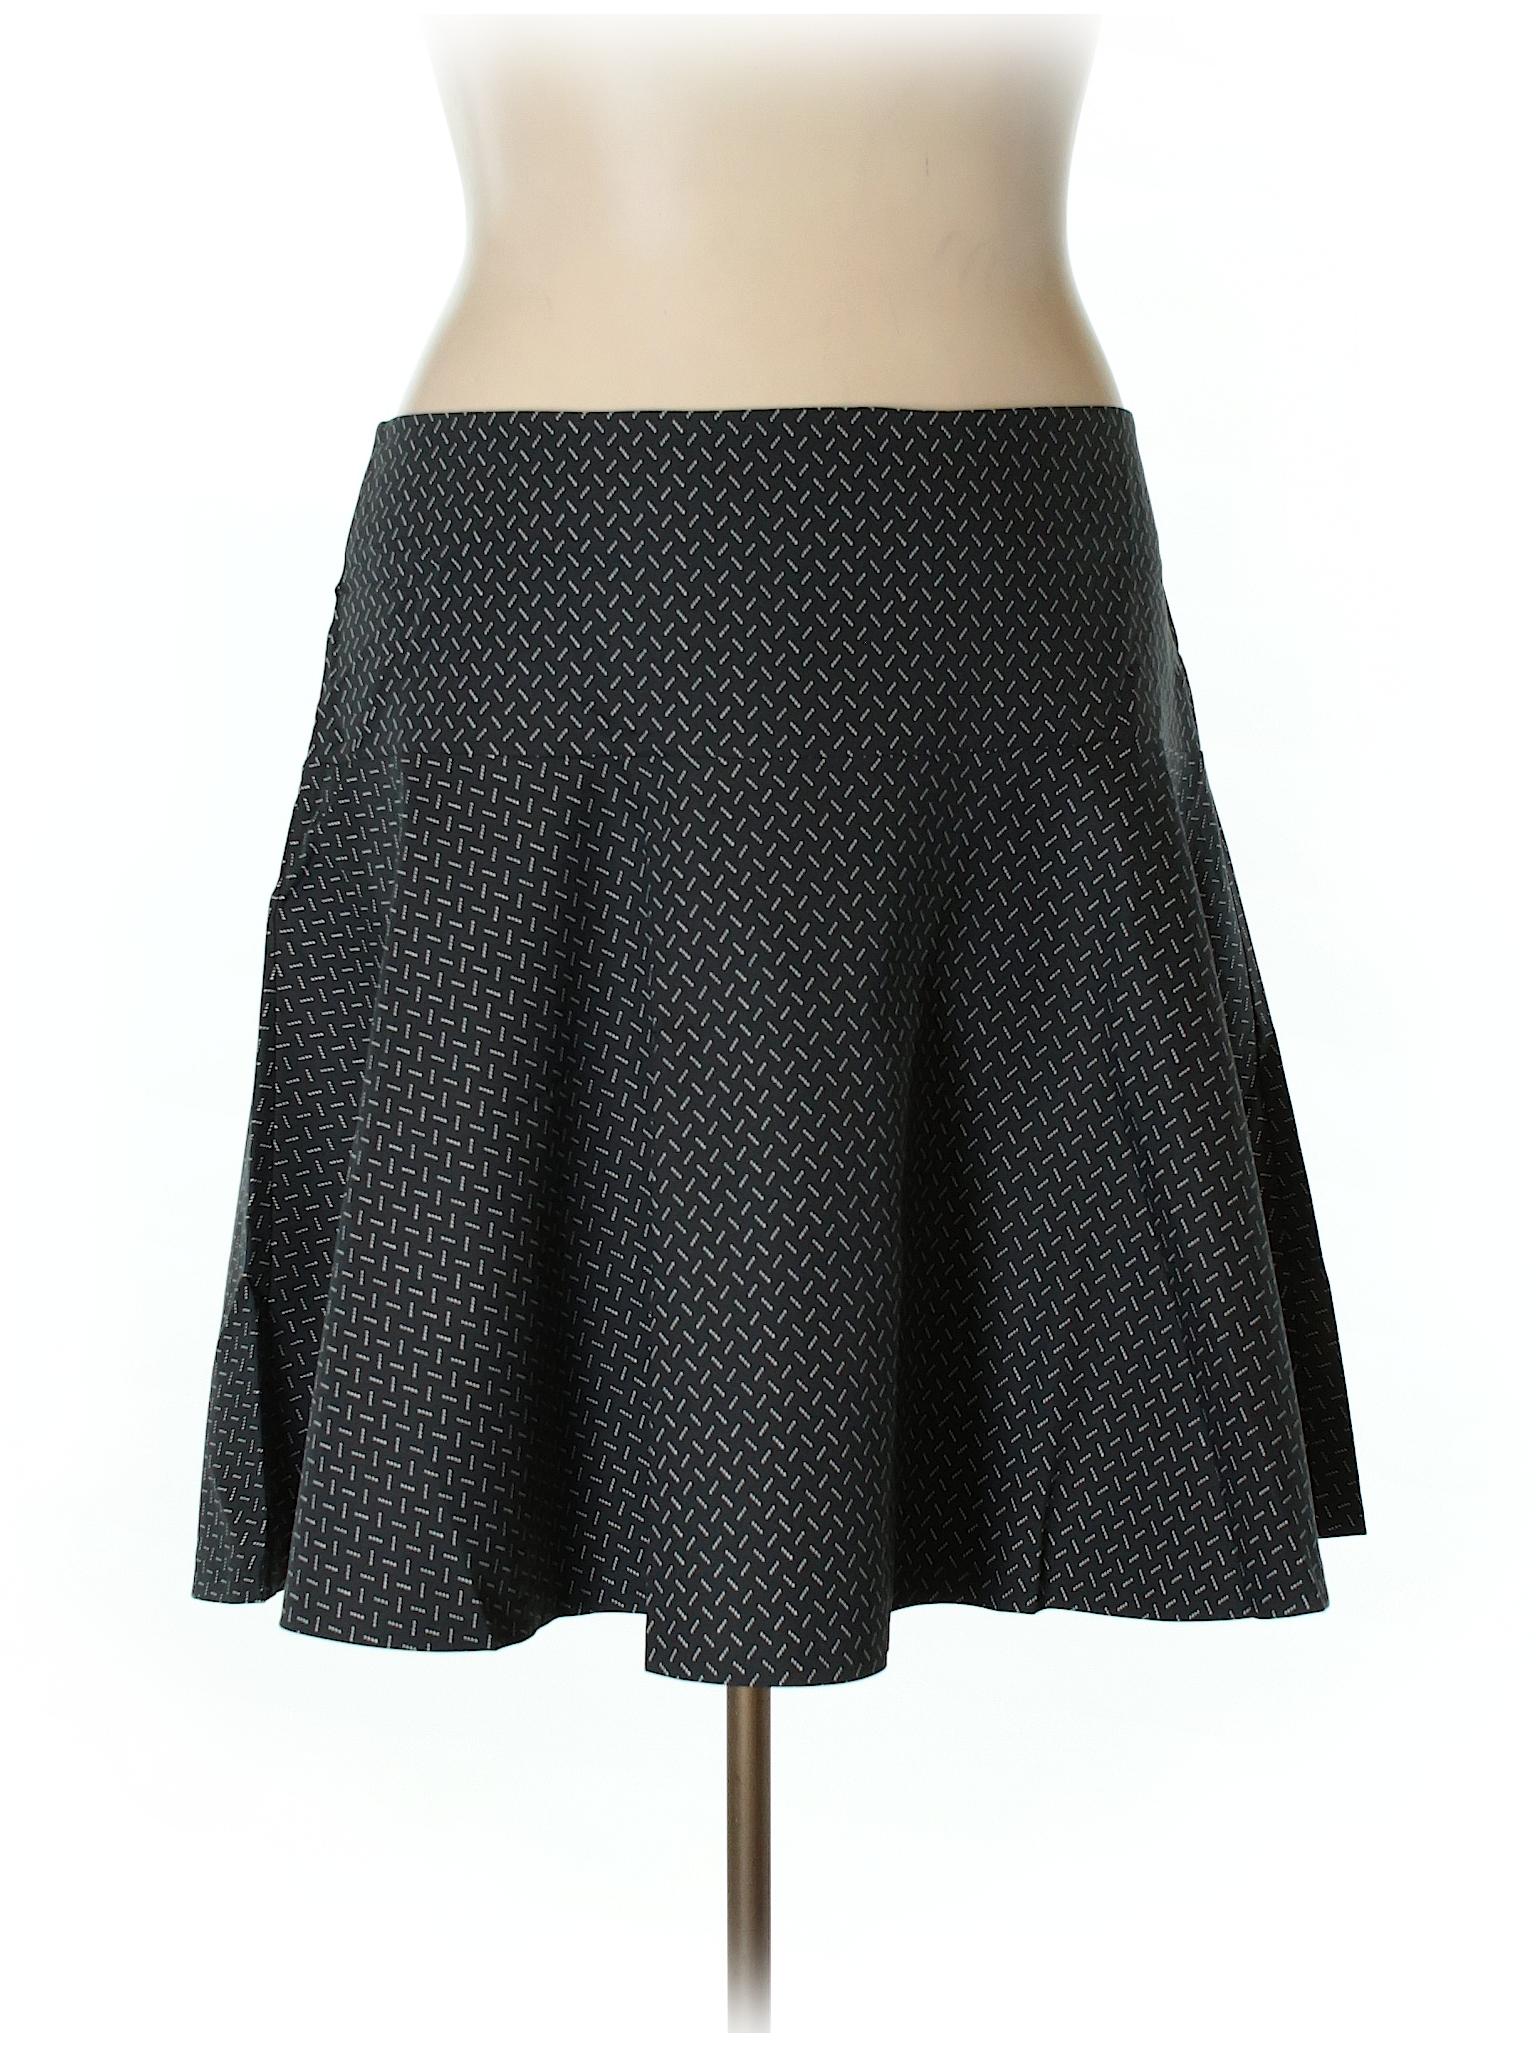 Casual Boutique Casual Skirt Boutique 8Eqrw6E